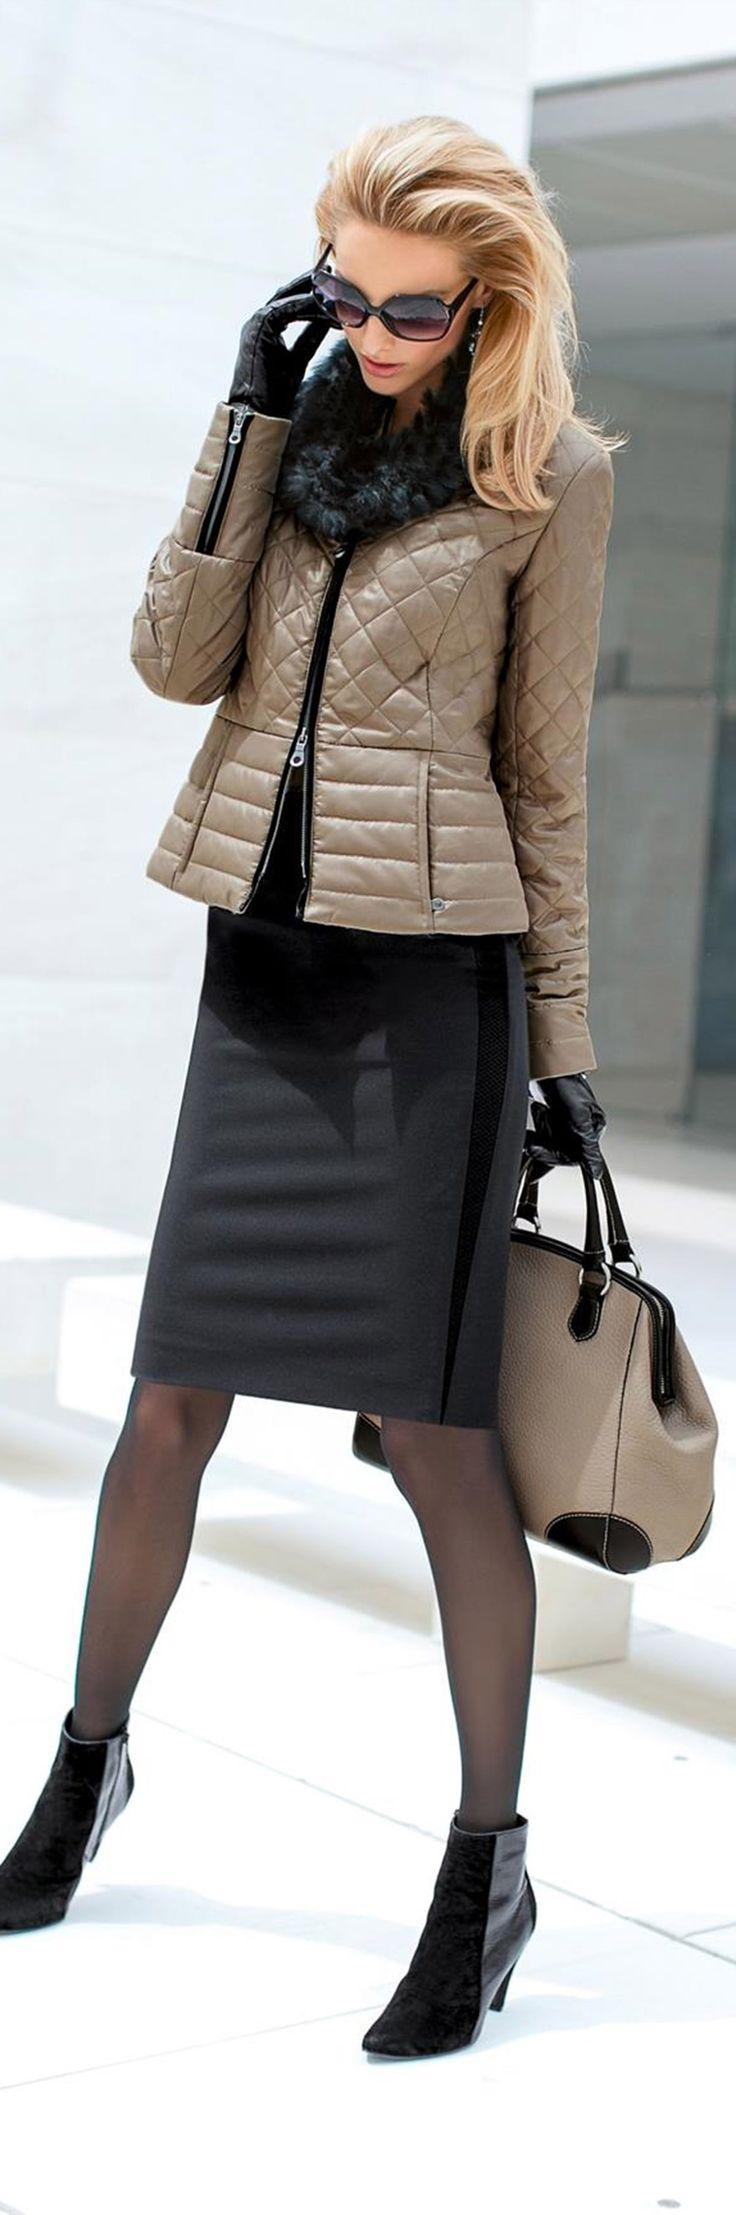 Action woman Find More at => http://feedproxy.google.com/~r/amazingoutfits/~3/4OTVWez5DQU/AmazingOutfits.page #fashion women